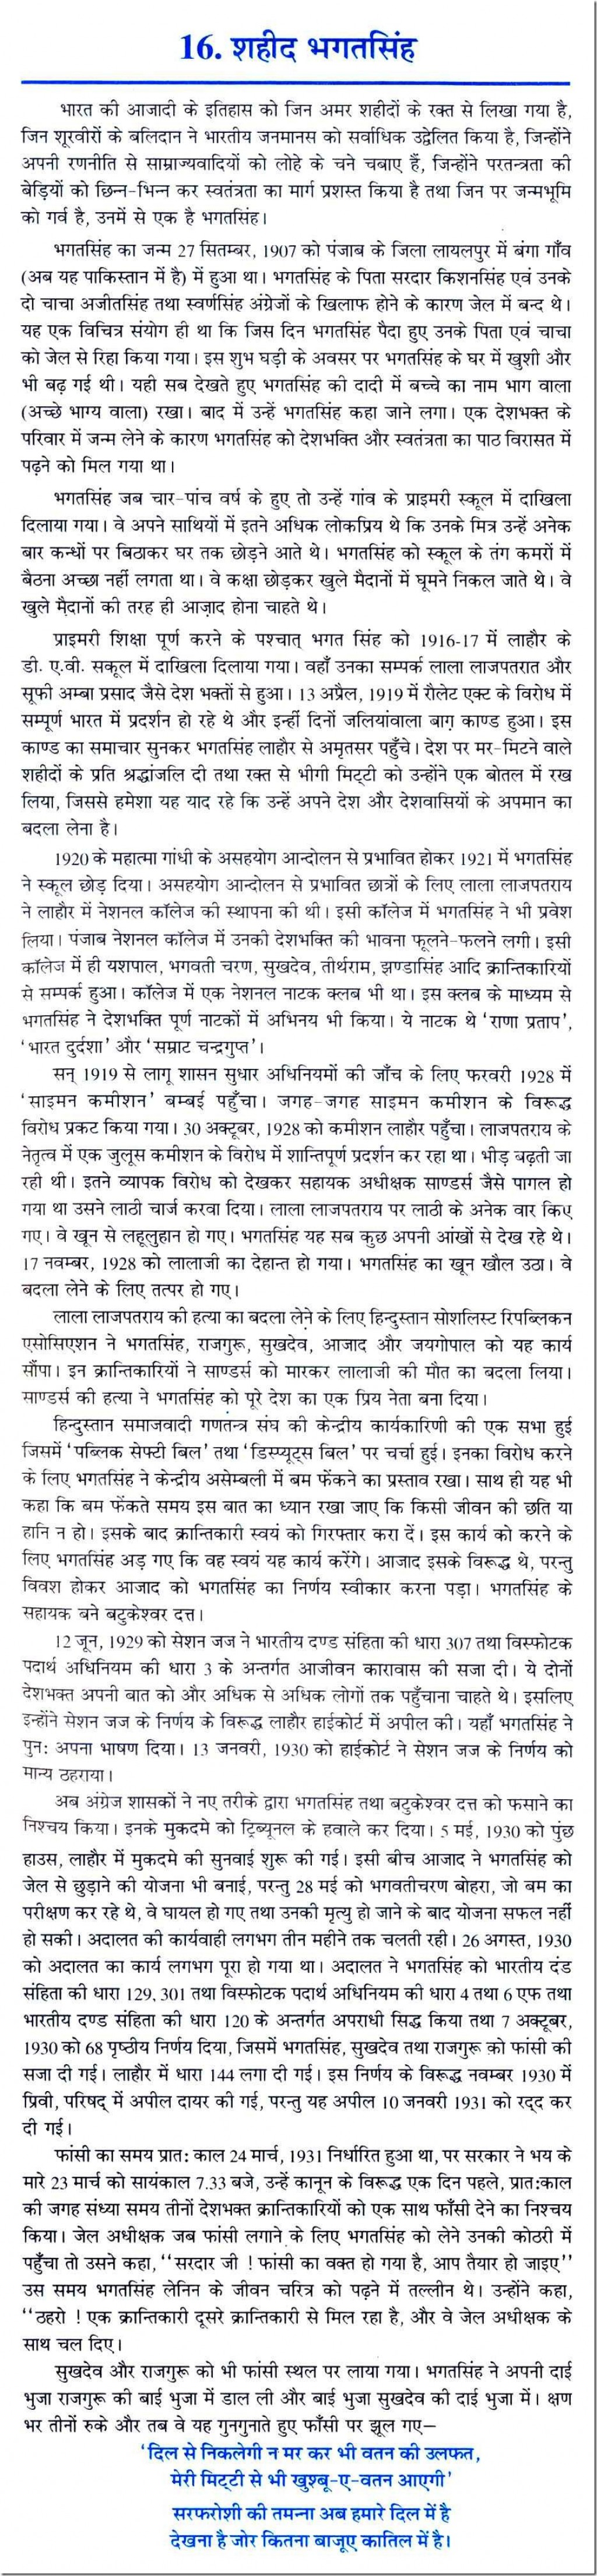 015 0020016 Thumb Essay Example On Bhagat Singh In Unique Marathi Short 100 Words Large